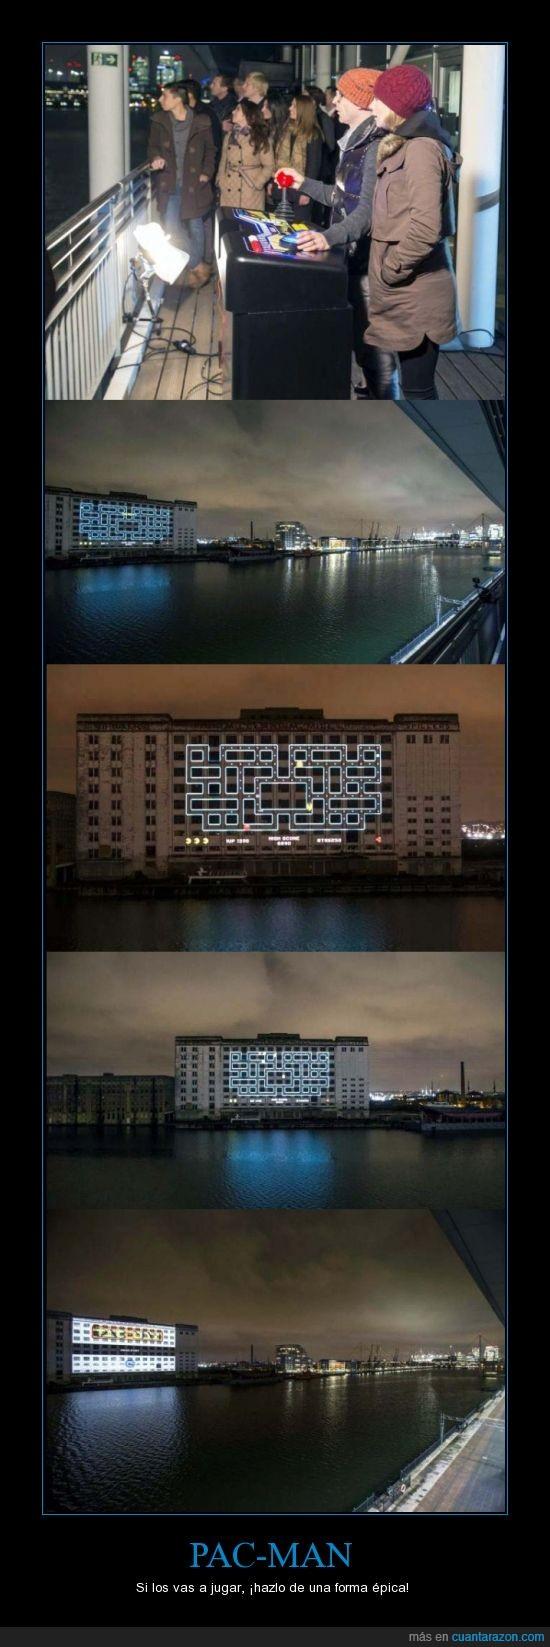 edificio,epico,jugar,man,pac,pac-man,que no pase un barco por favor,rio